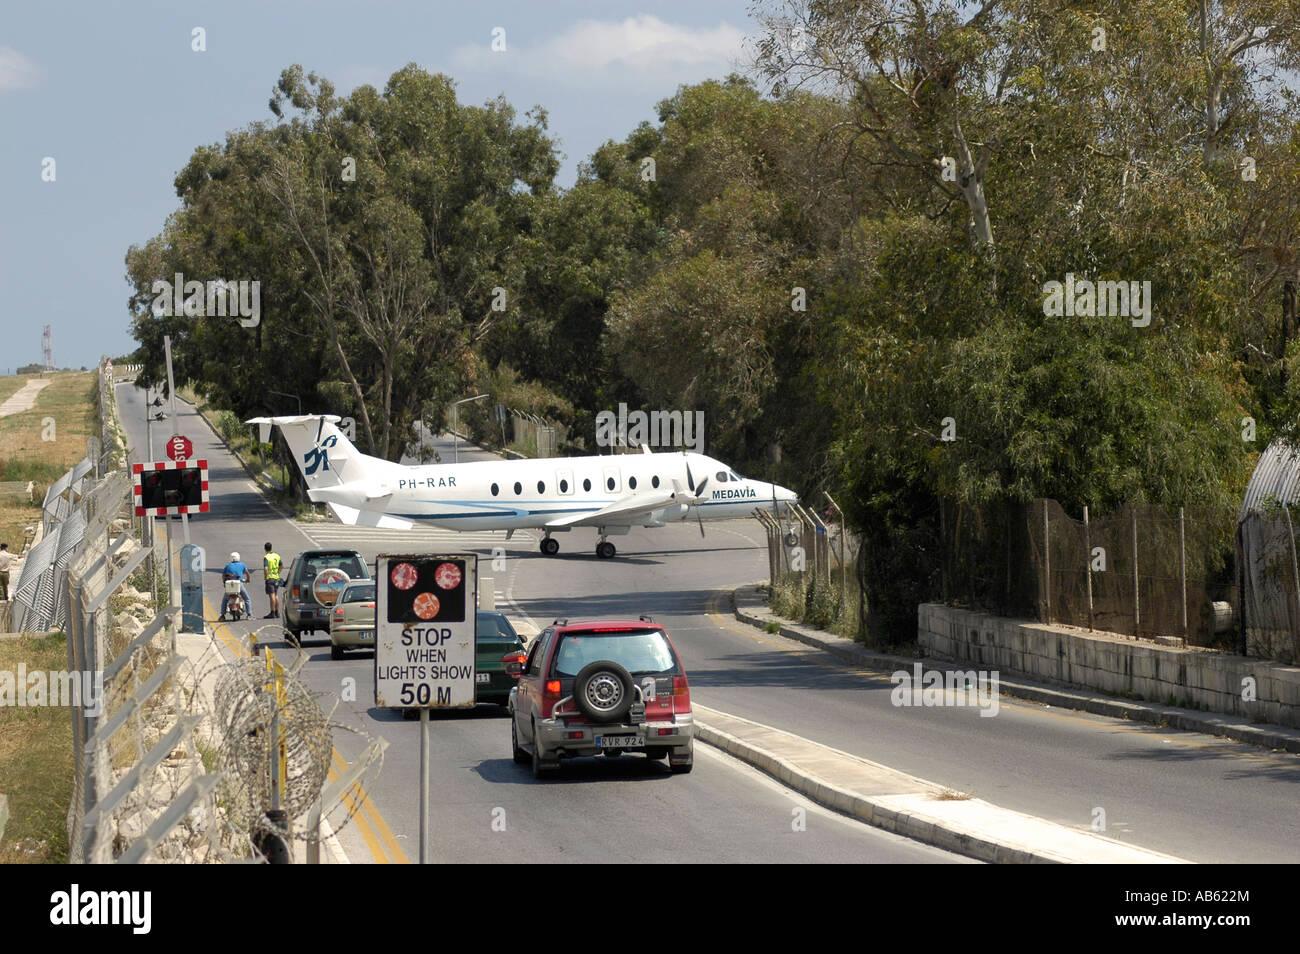 Aeroplane crossing the road. Beech 1900D Medical Evacuation  Plane - Stock Image